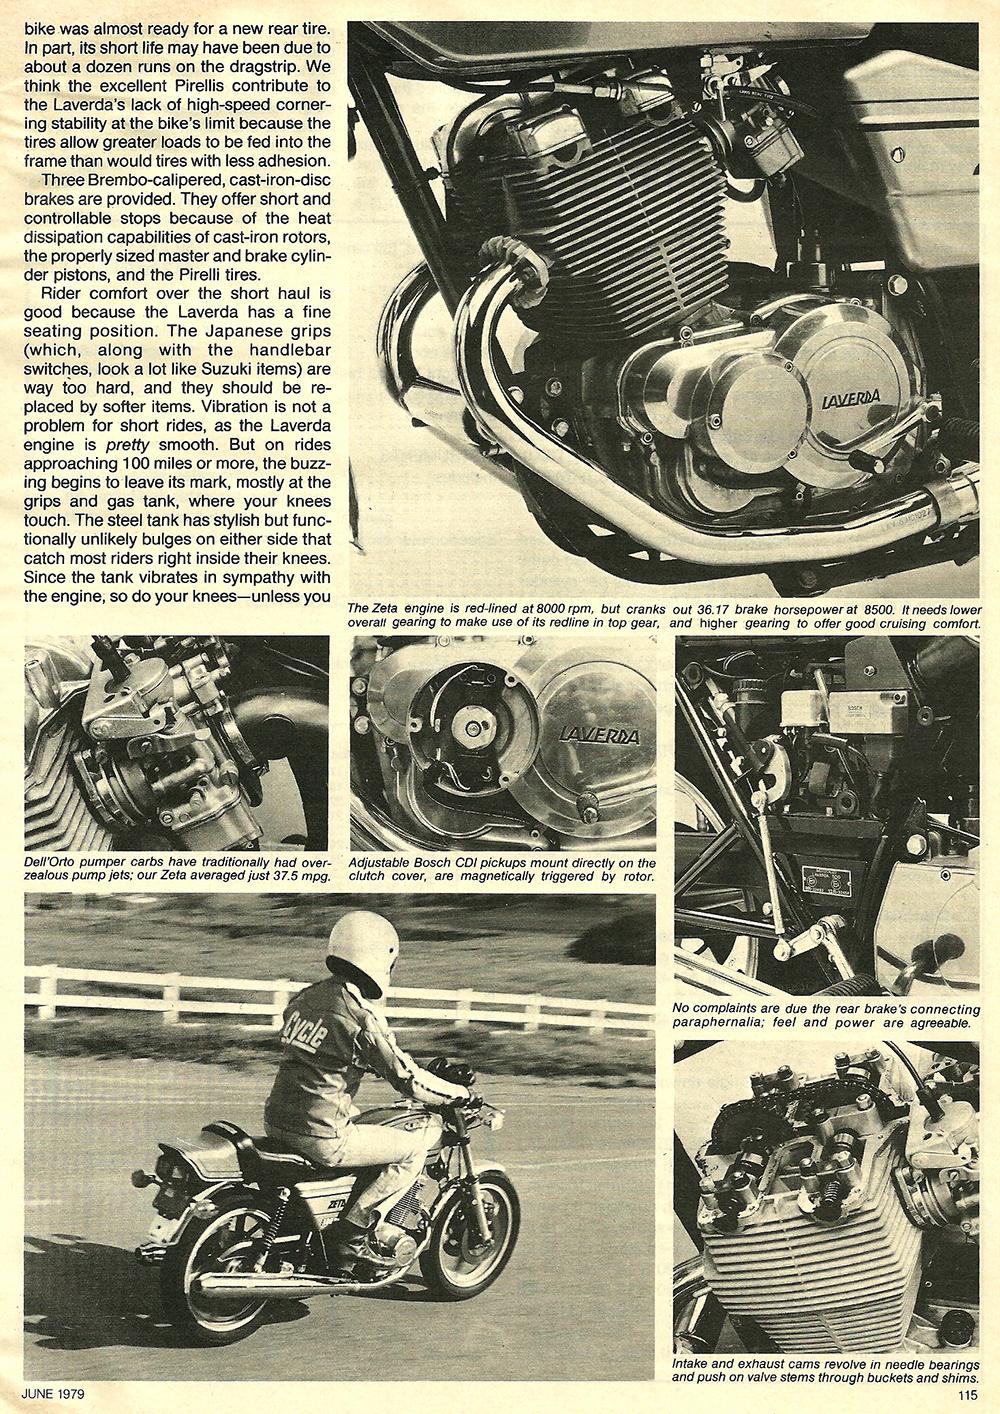 1979 Laverda 500 Zeta road test 6.jpg